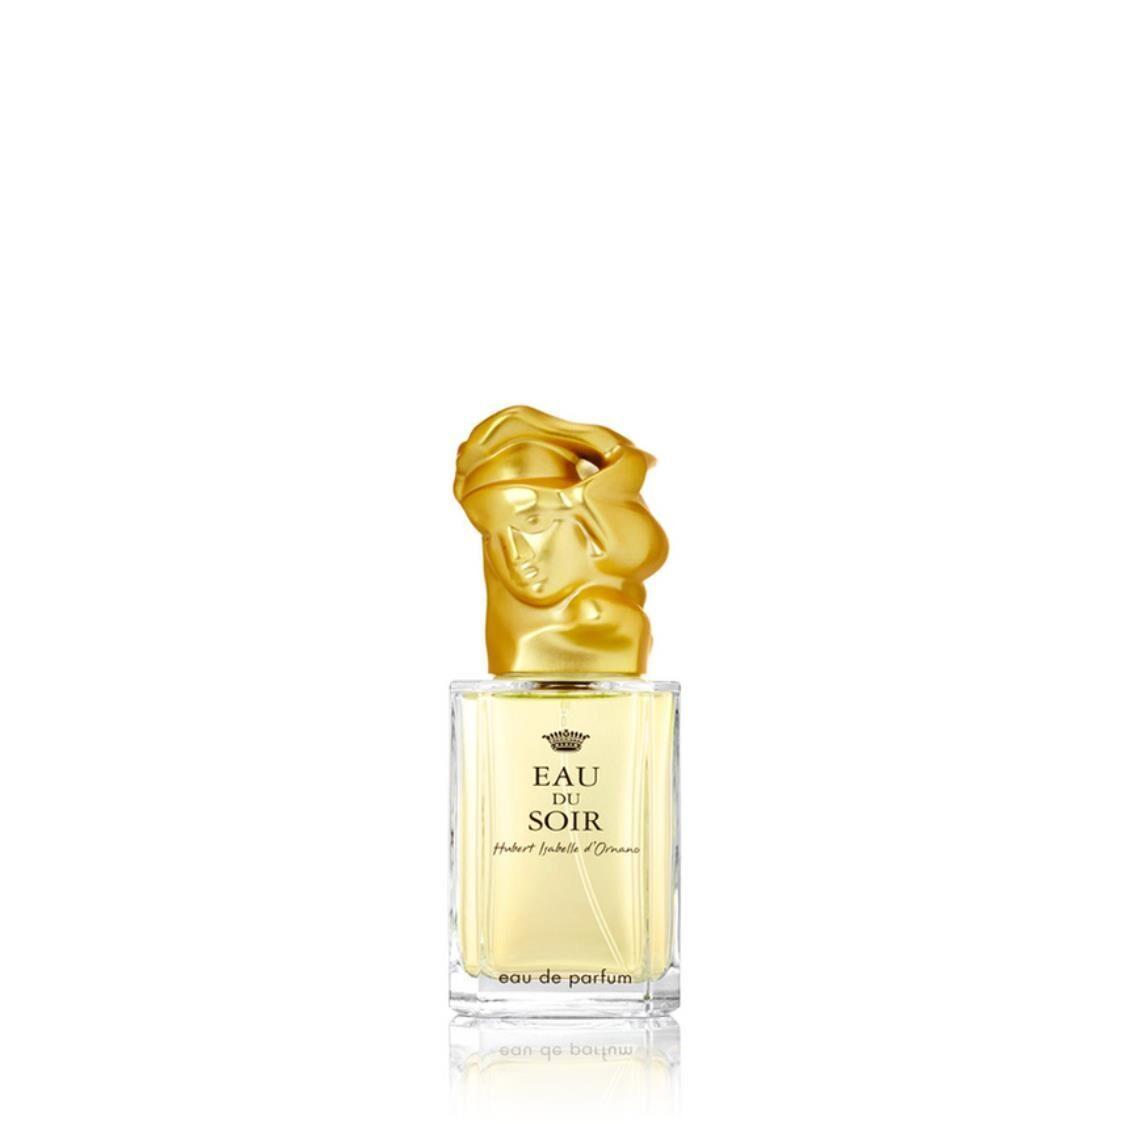 Sisley Eau de Parfum Eau du Soir 30ml